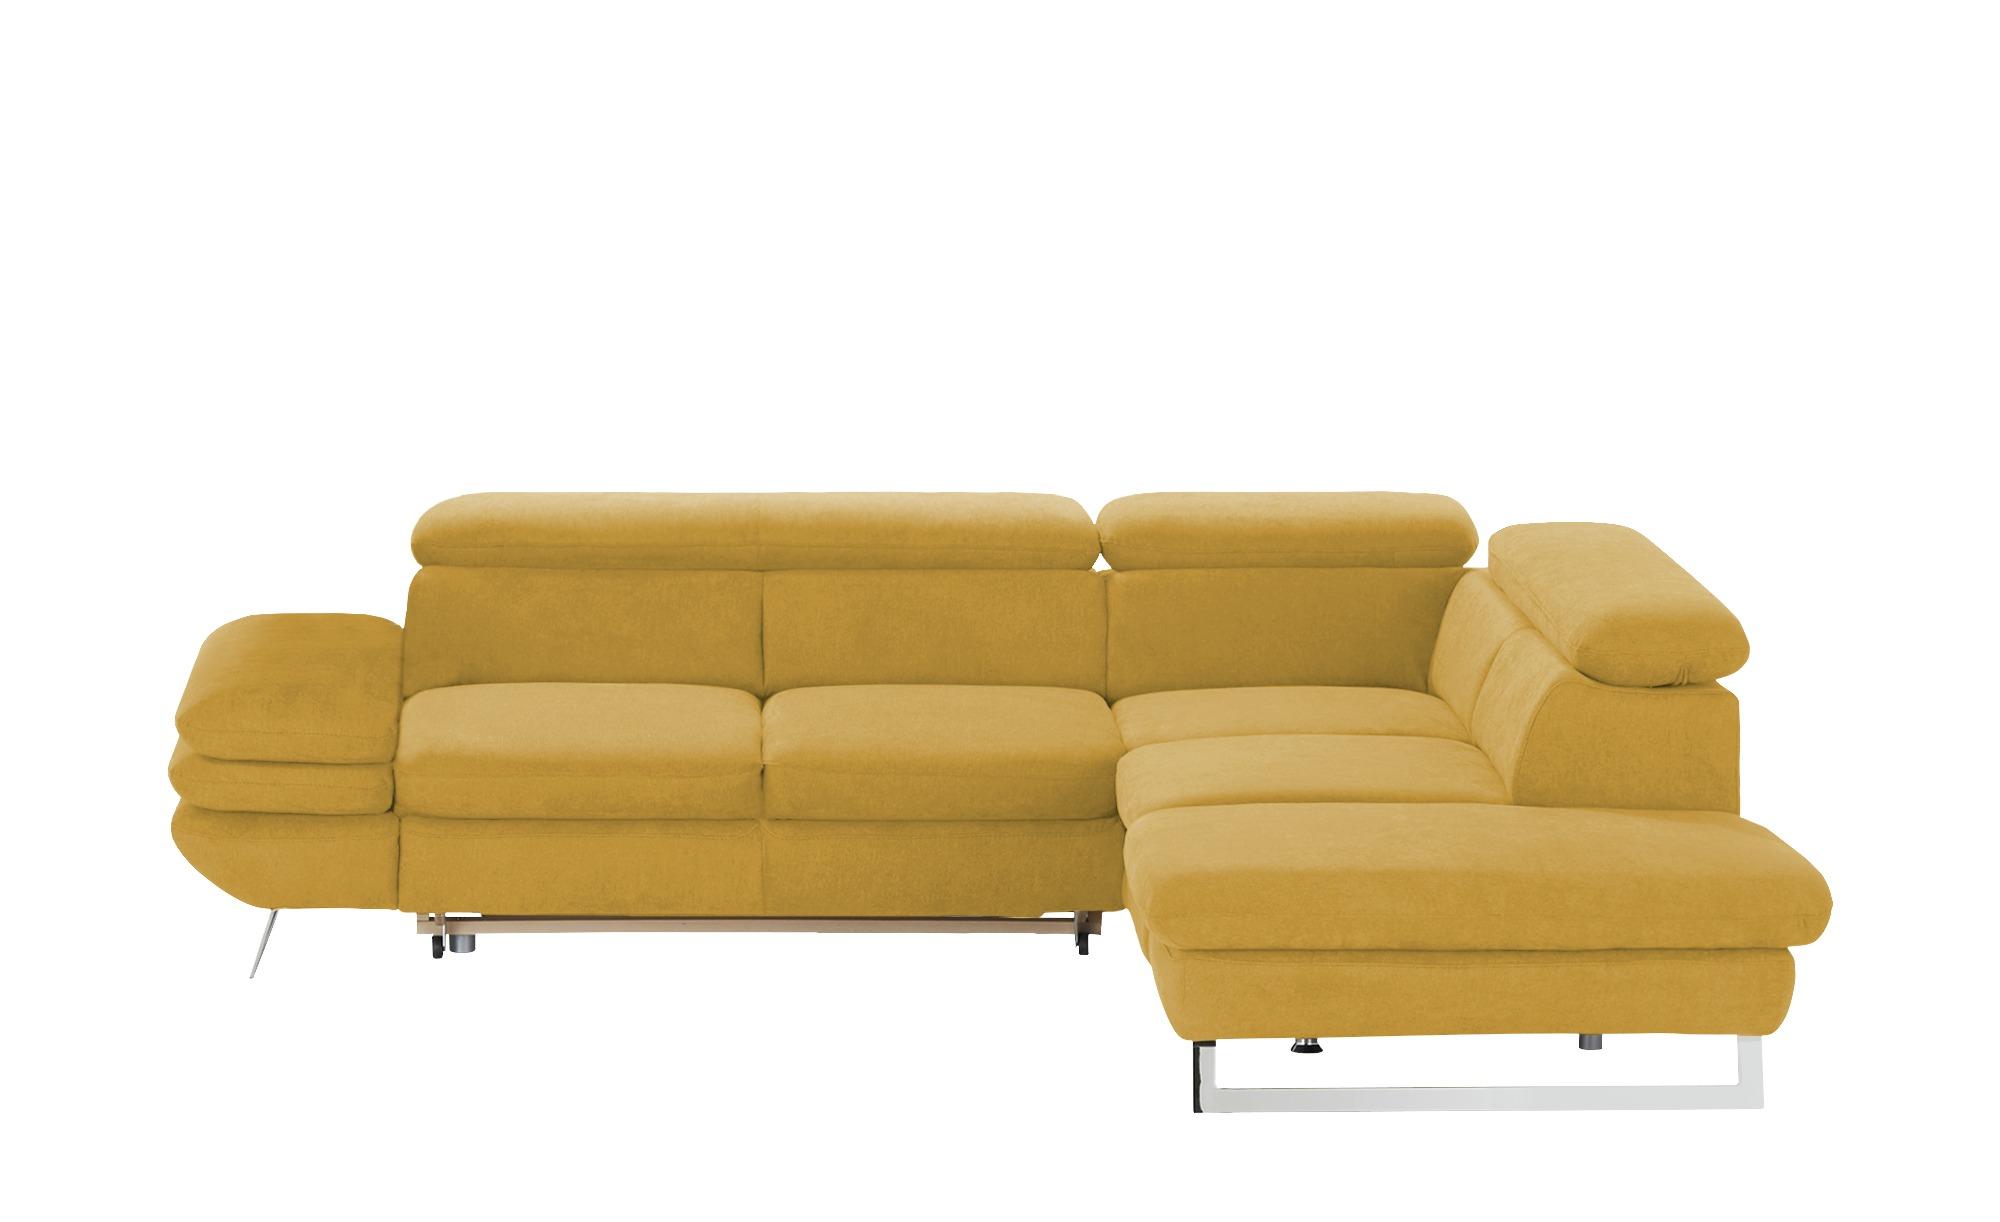 uno Ecksofa  Preston ¦ gelb ¦ Maße (cm): H: 74 Polstermöbel > Sofas > Ecksofas - Höffner